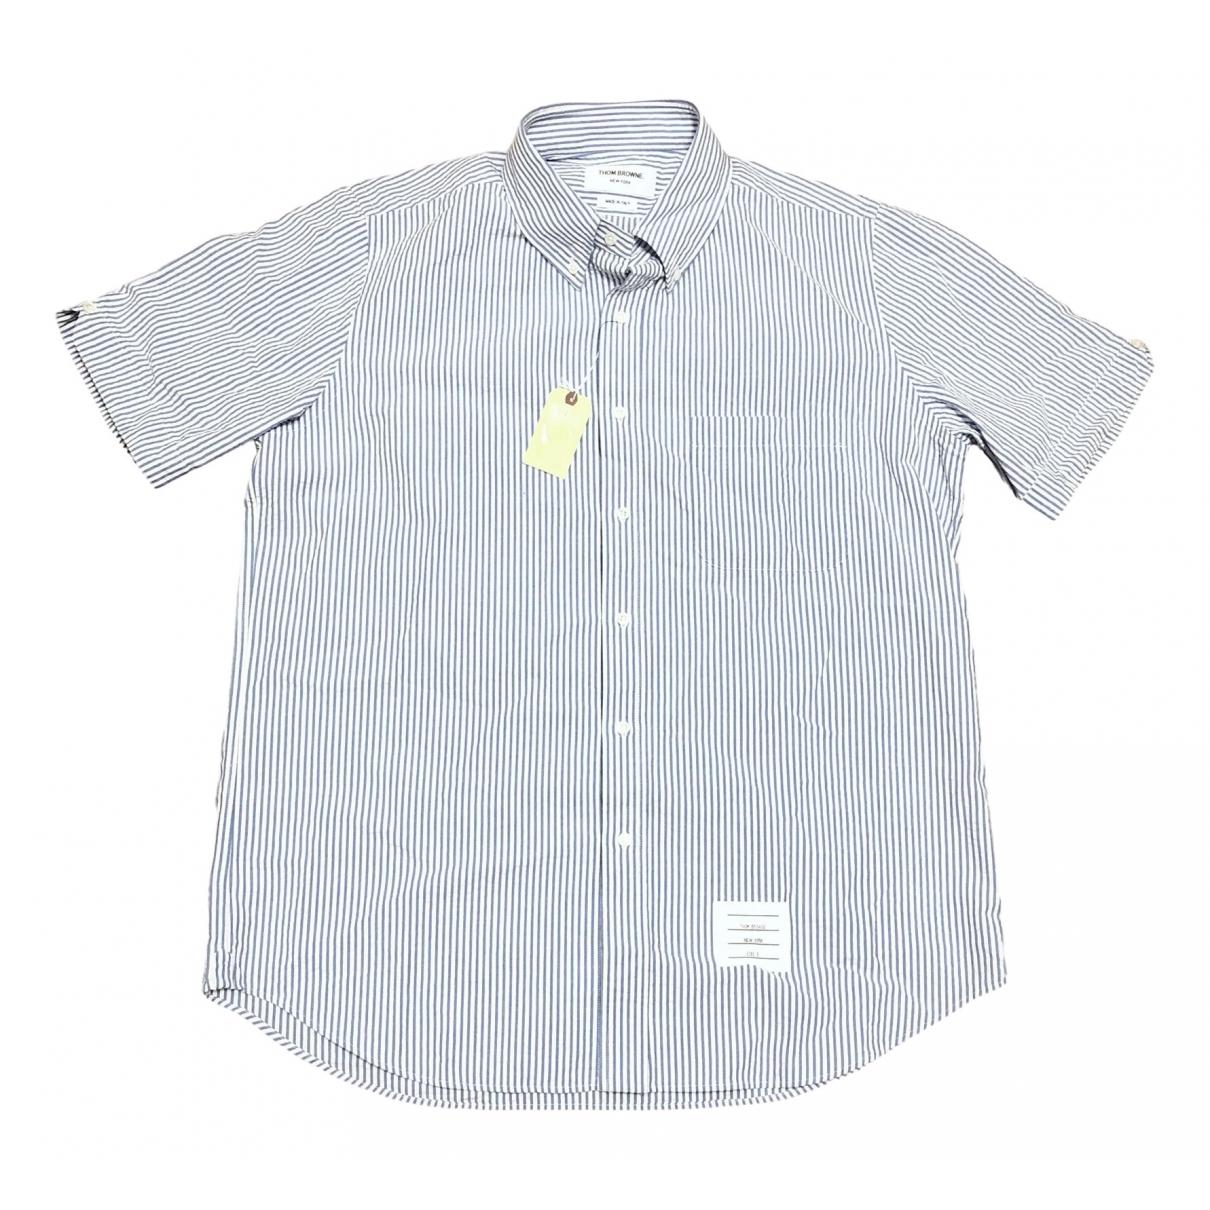 Thom Browne \N Blue Cotton Shirts for Men L International